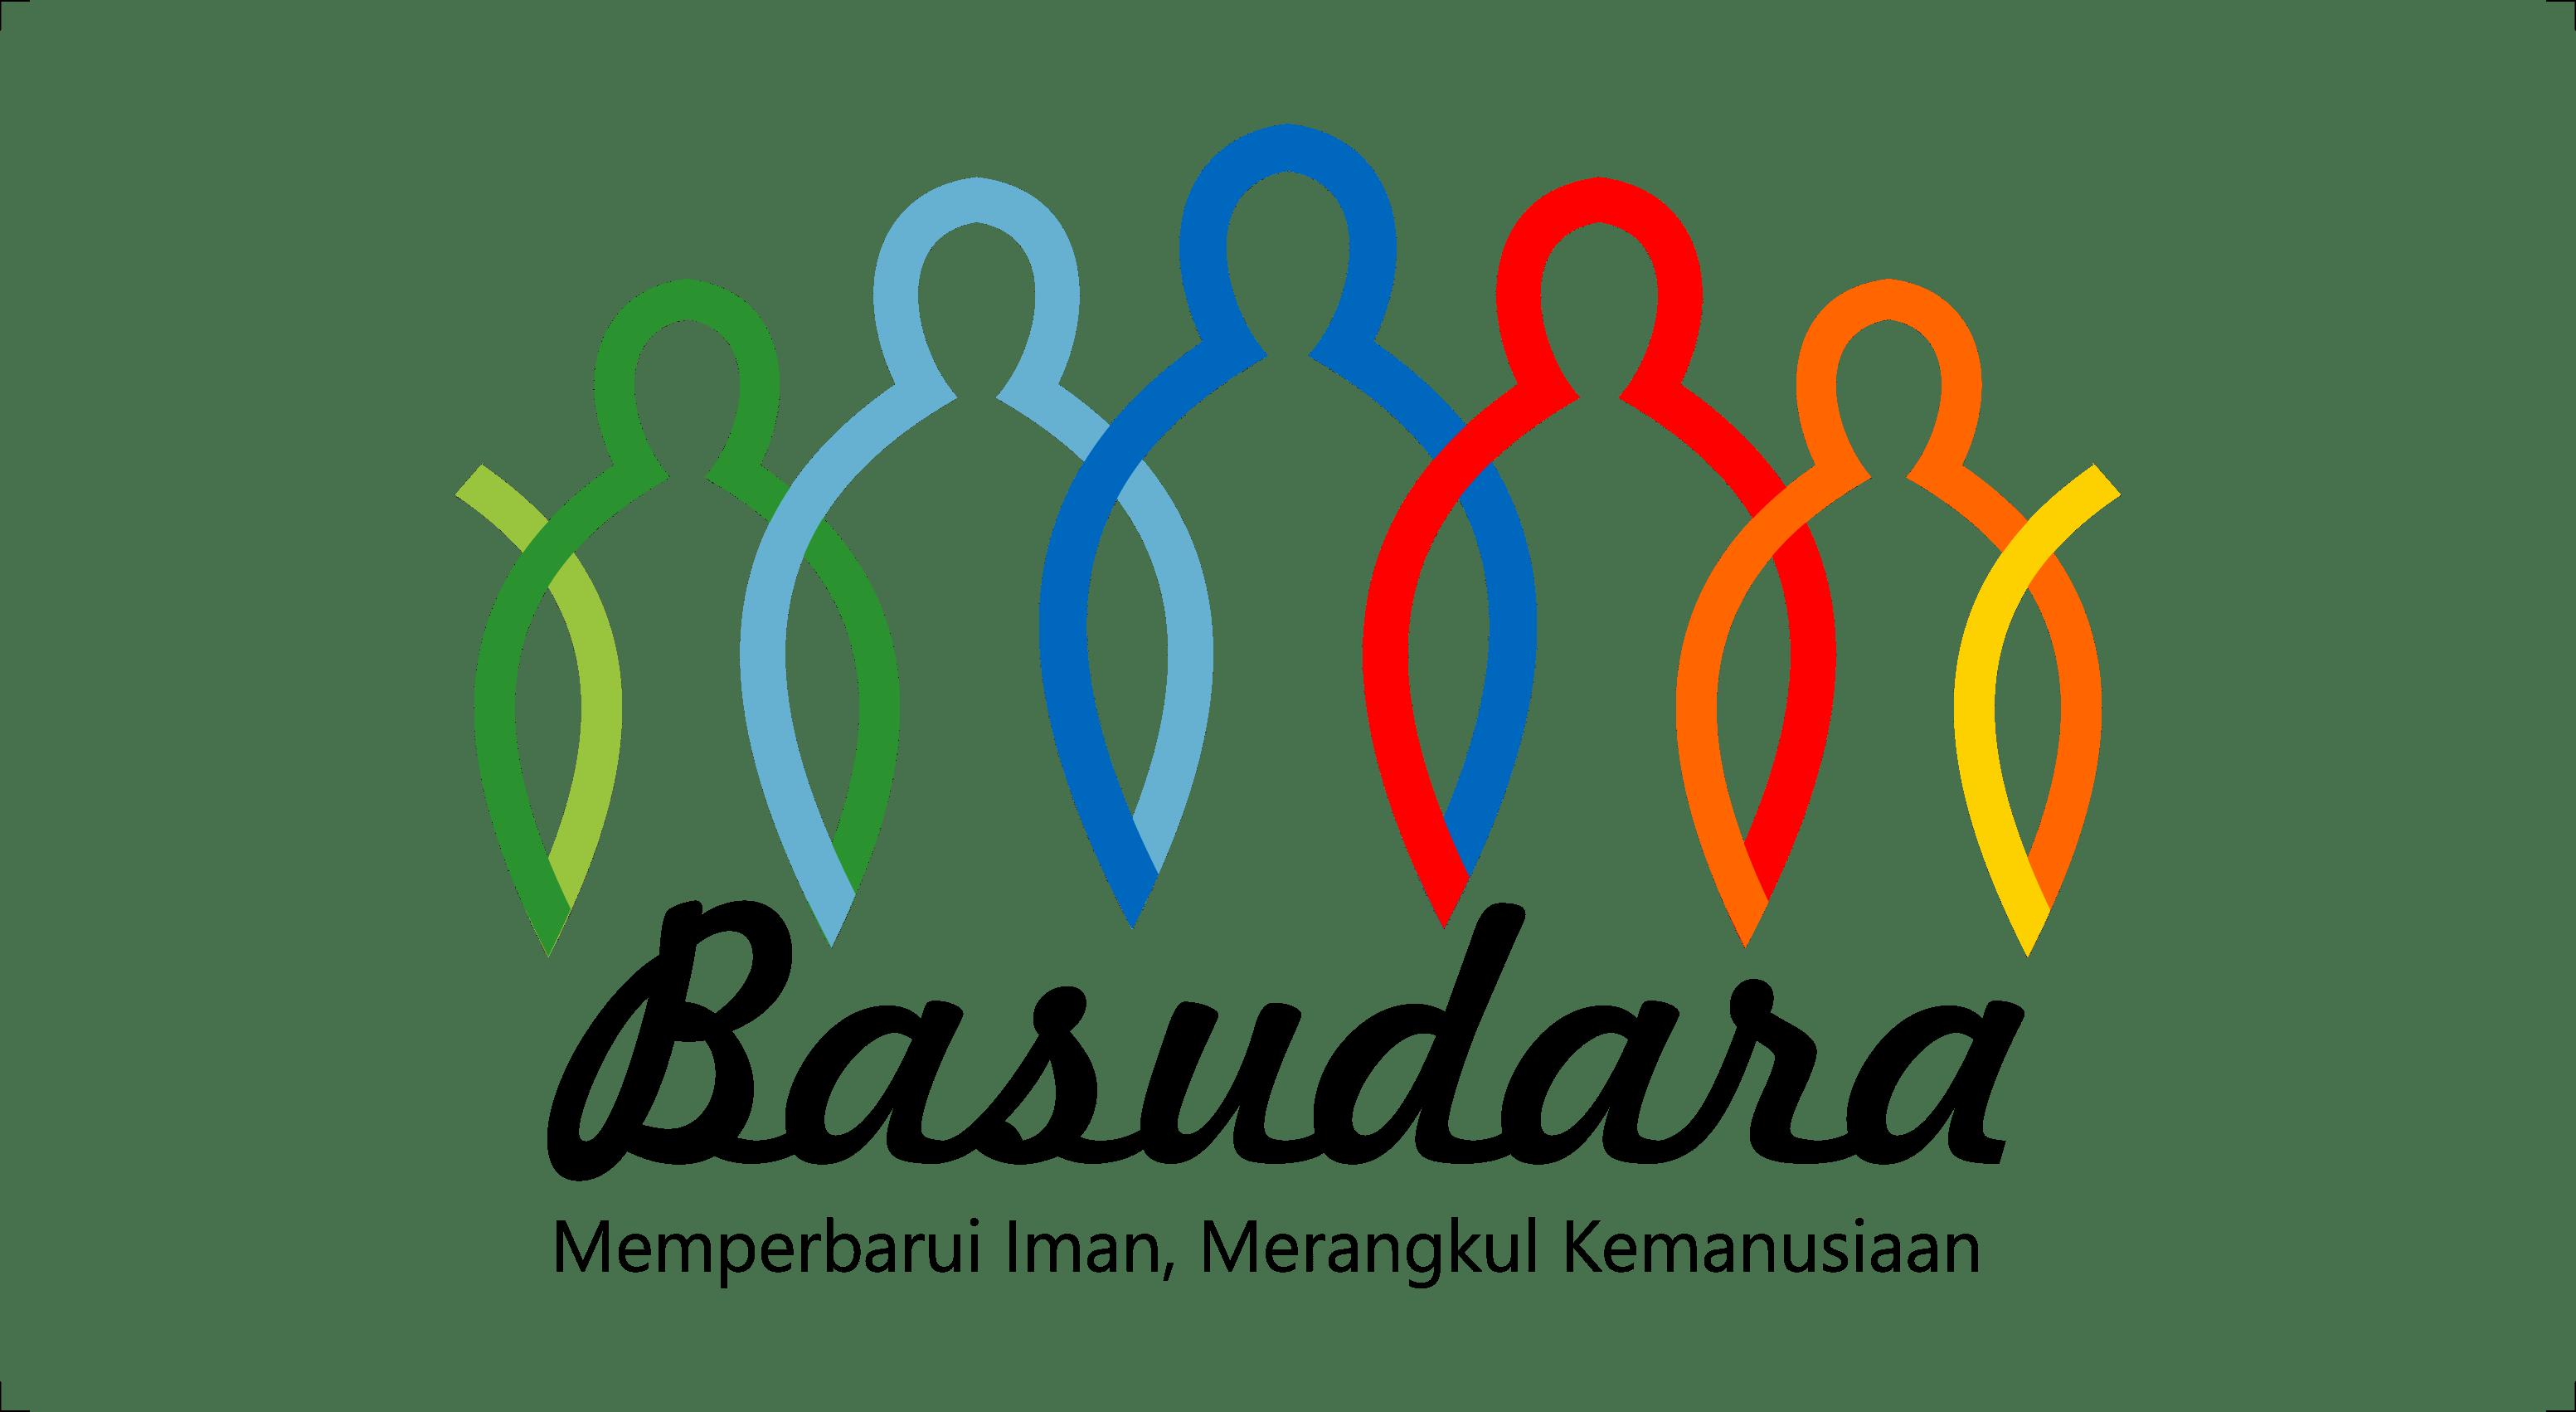 Basudara.ID